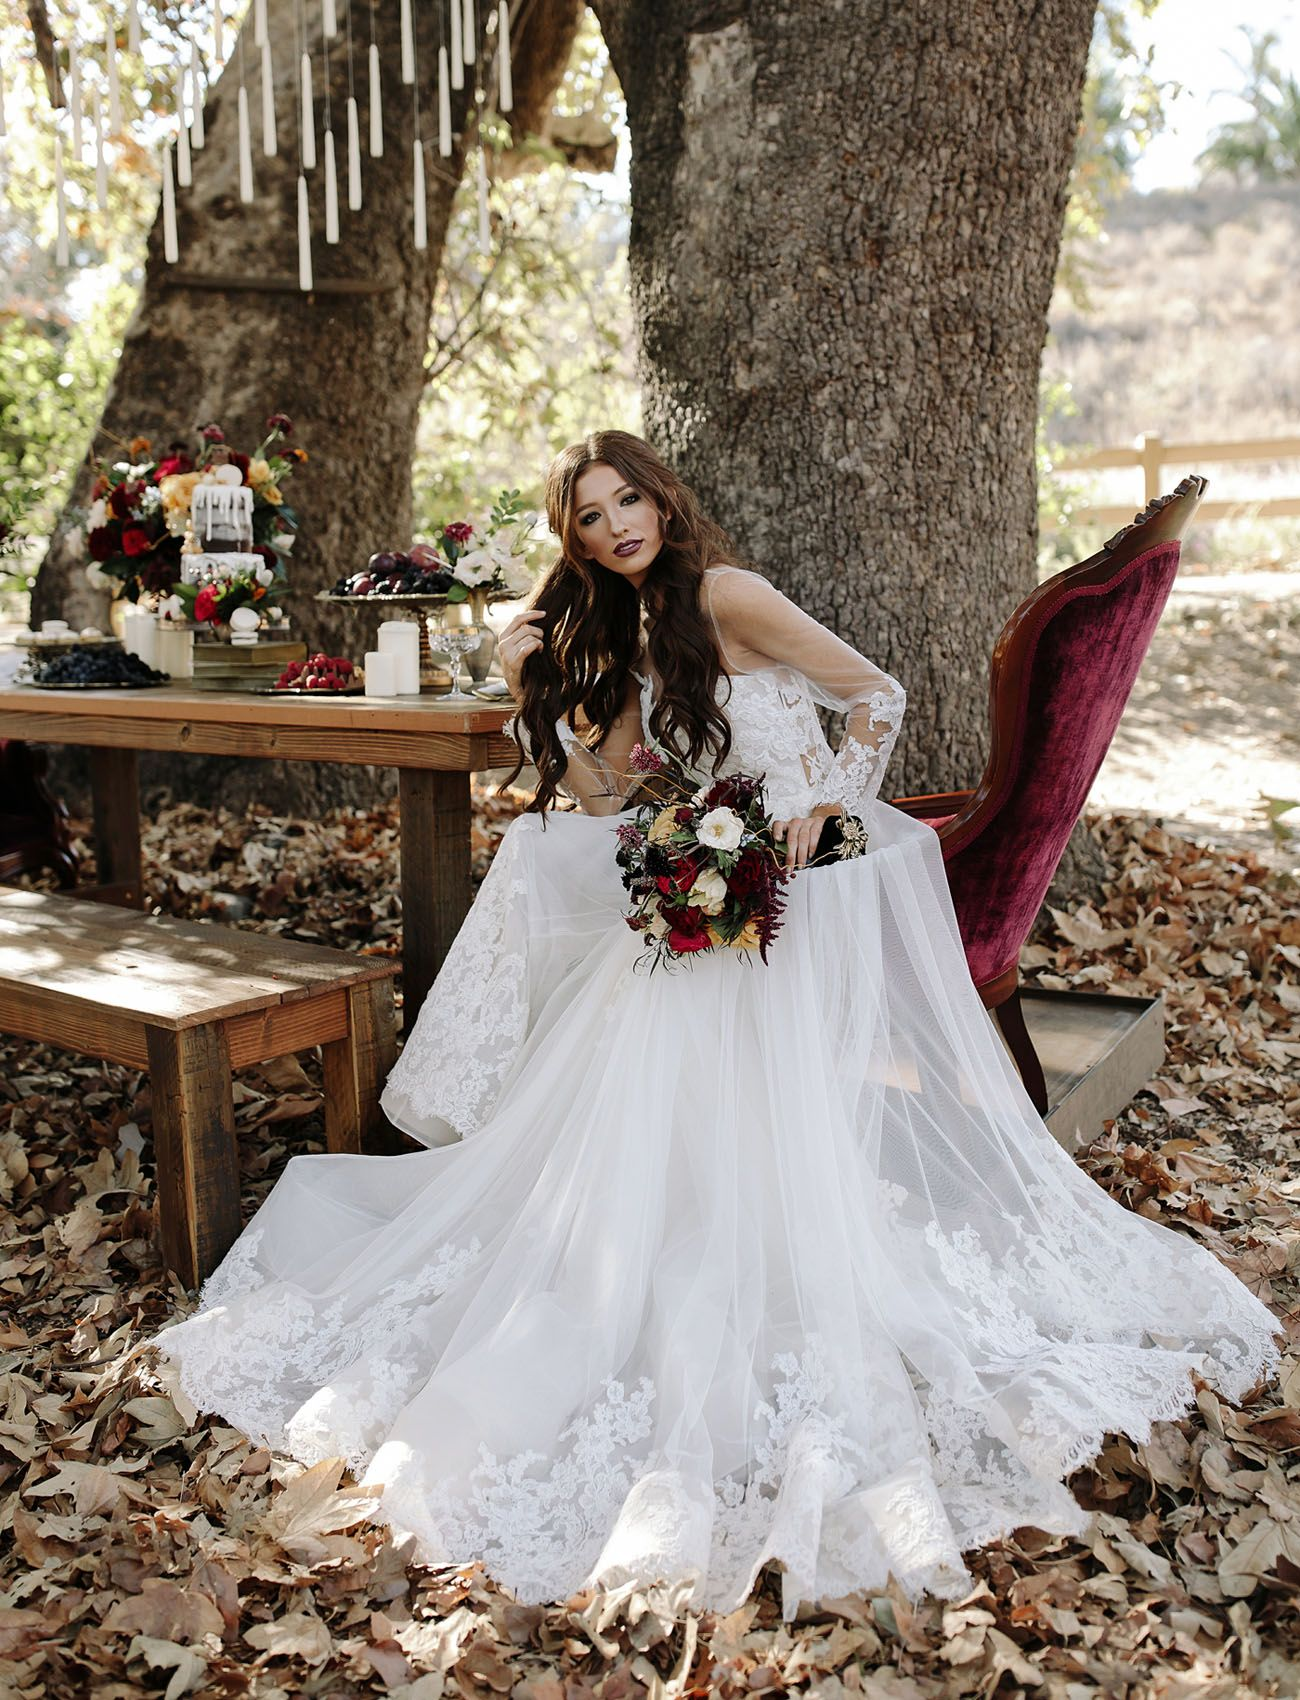 Harry potter wedding dress  Fantastic Beasts Meets Harry Potter Wedding Inspiration